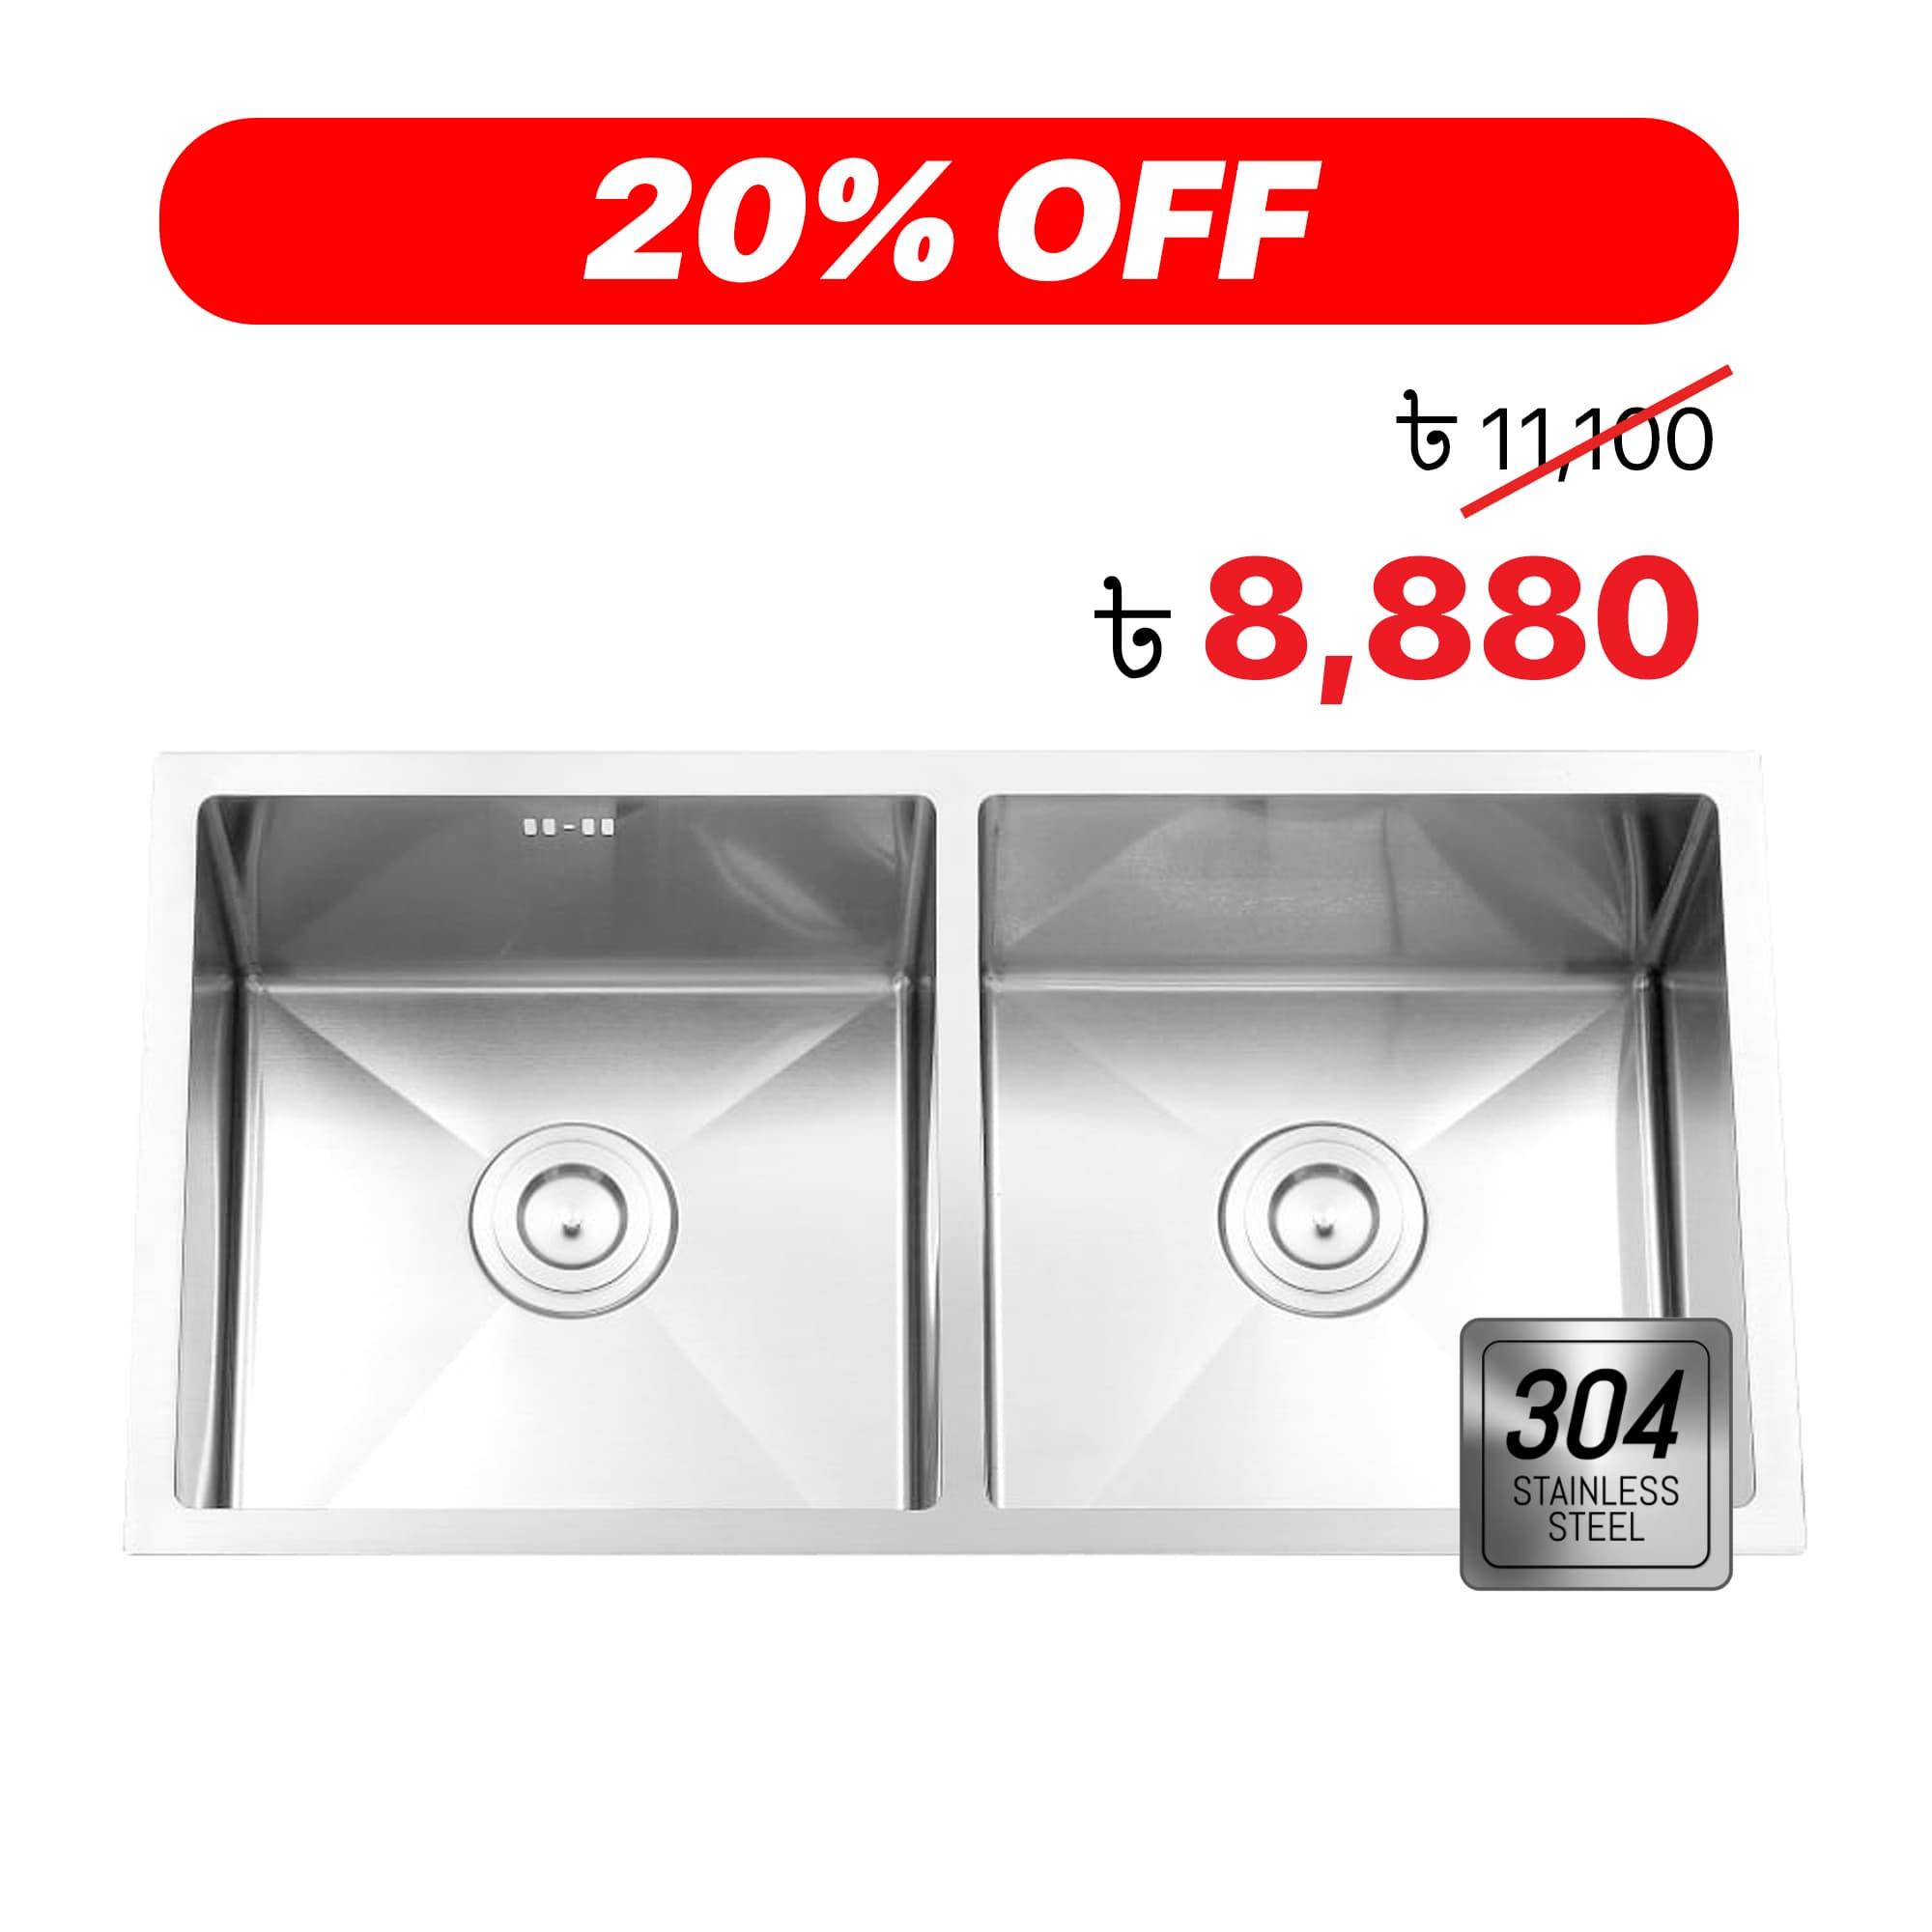 Hand made kitchen sink price dhaka Feb - 1